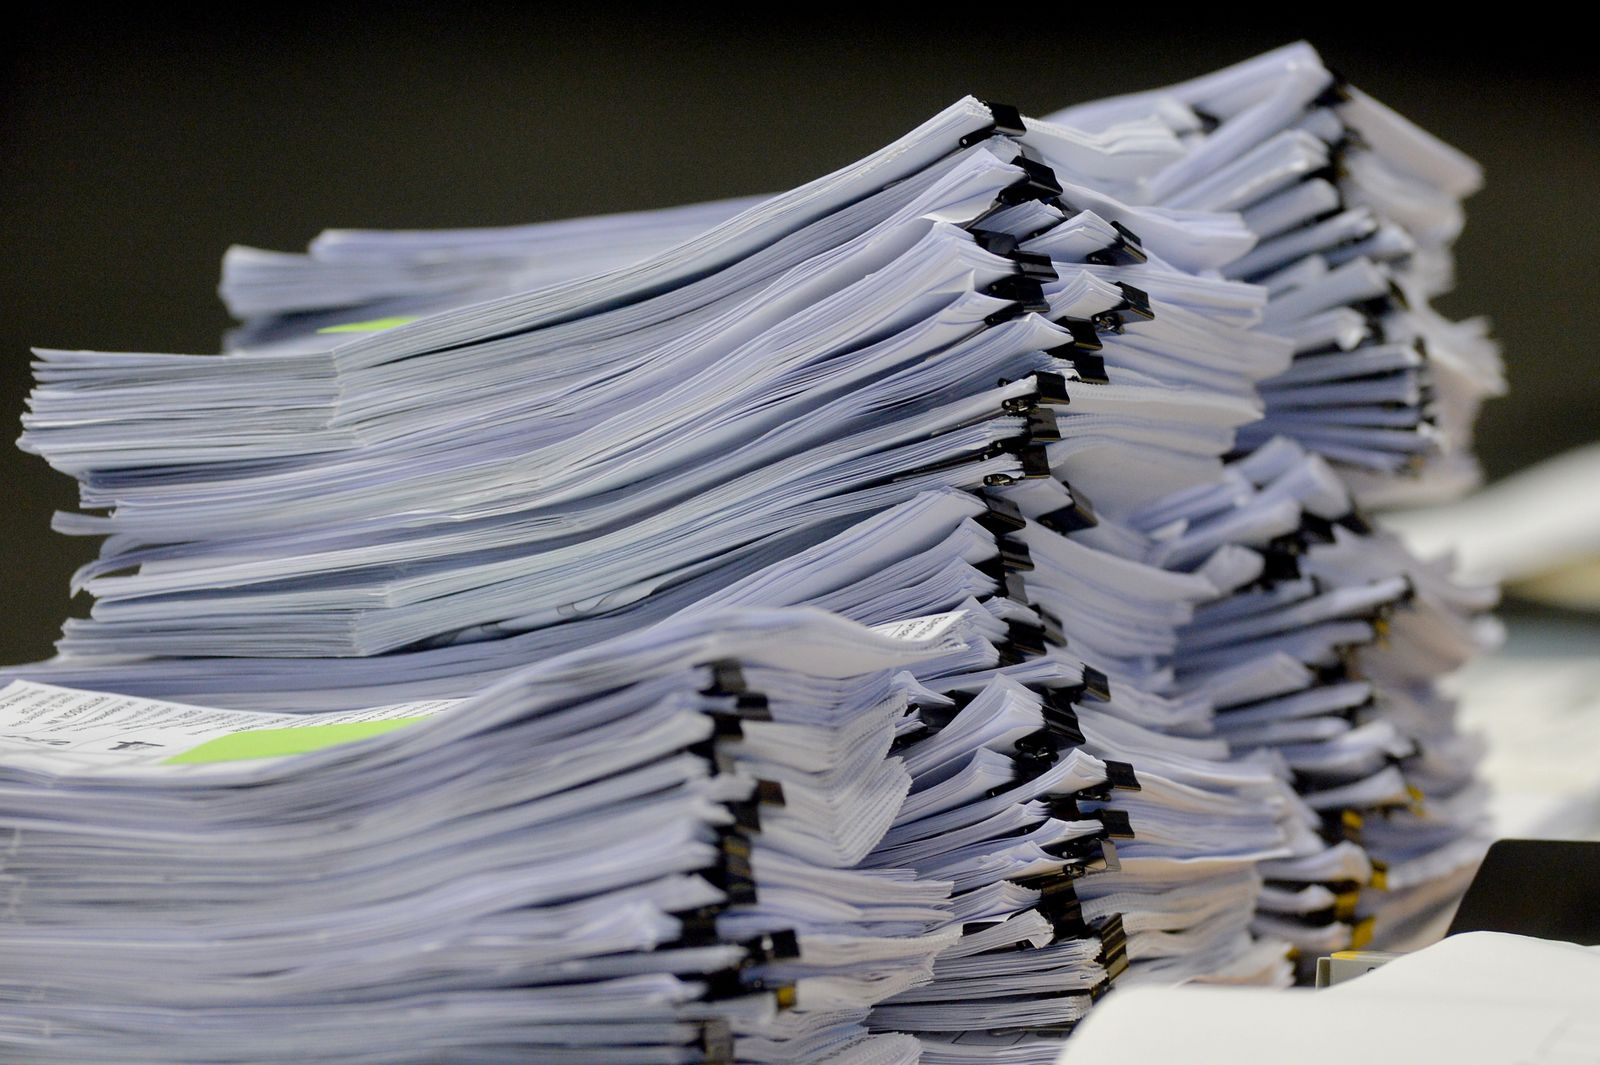 Stapel Papier / Berichte